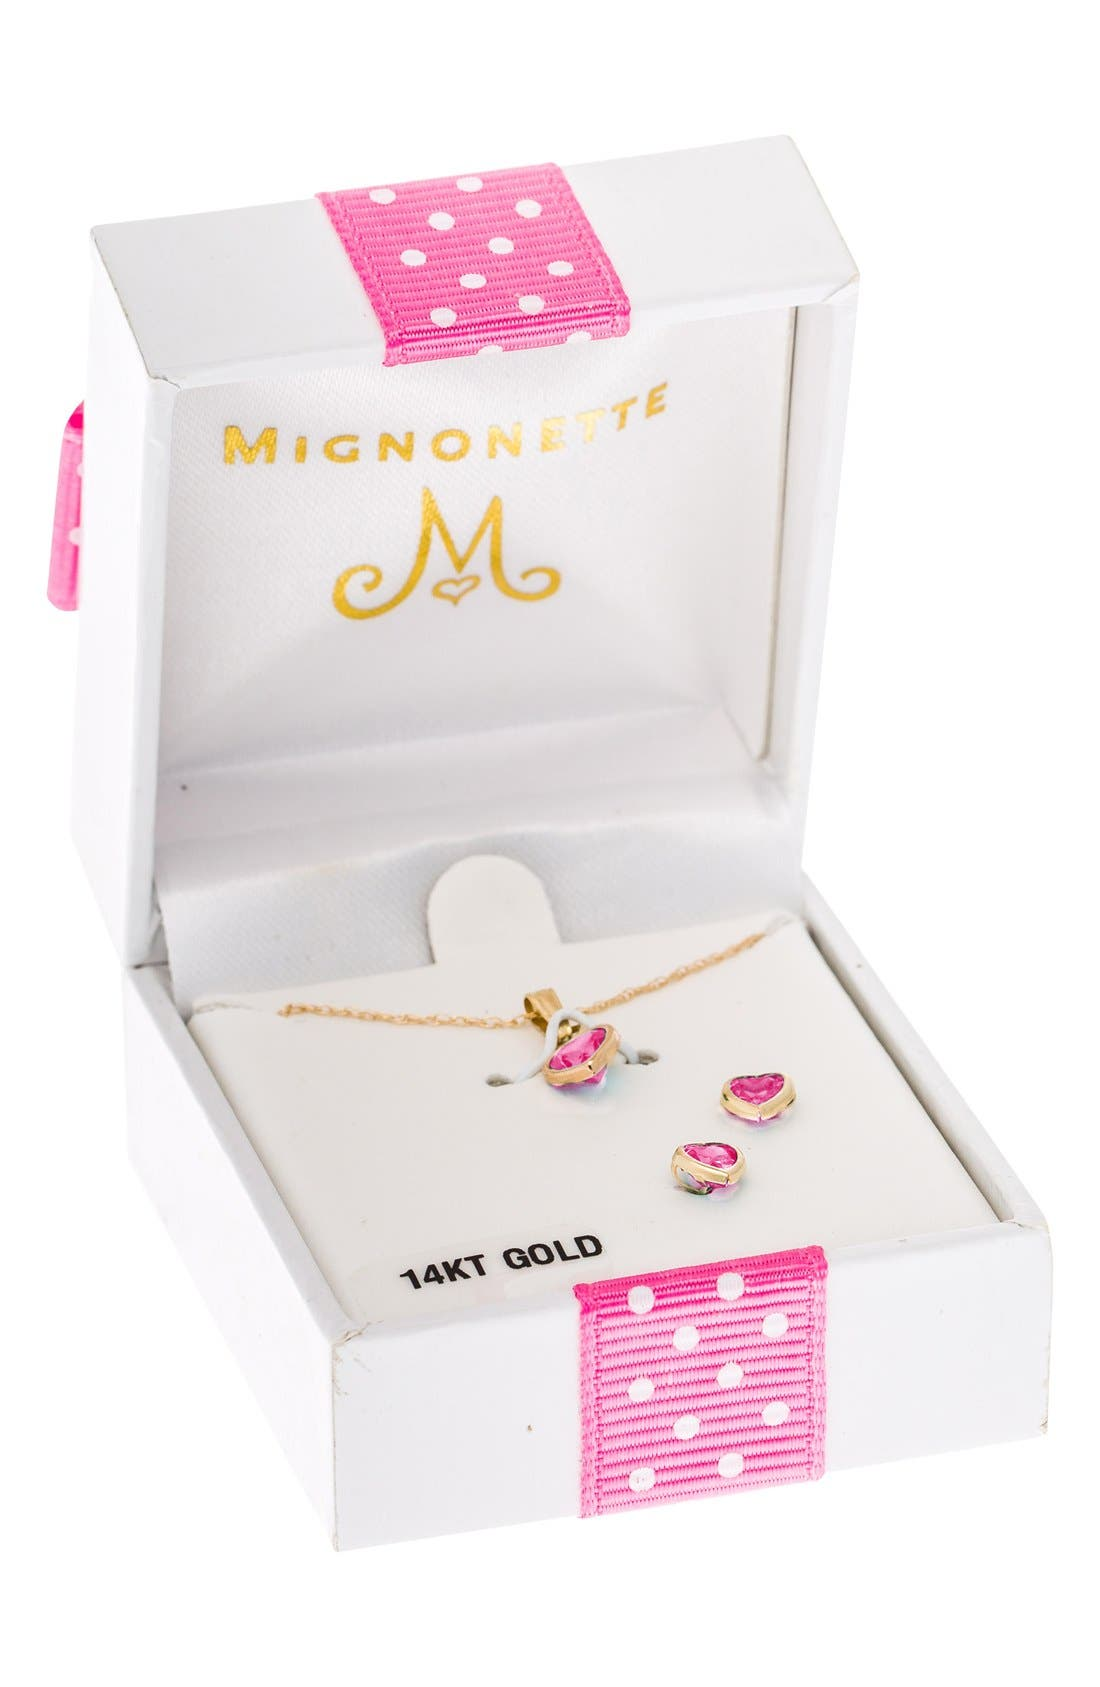 14k Gold Birthstone Necklace & Stud Earrings,                             Alternate thumbnail 3, color,                             October